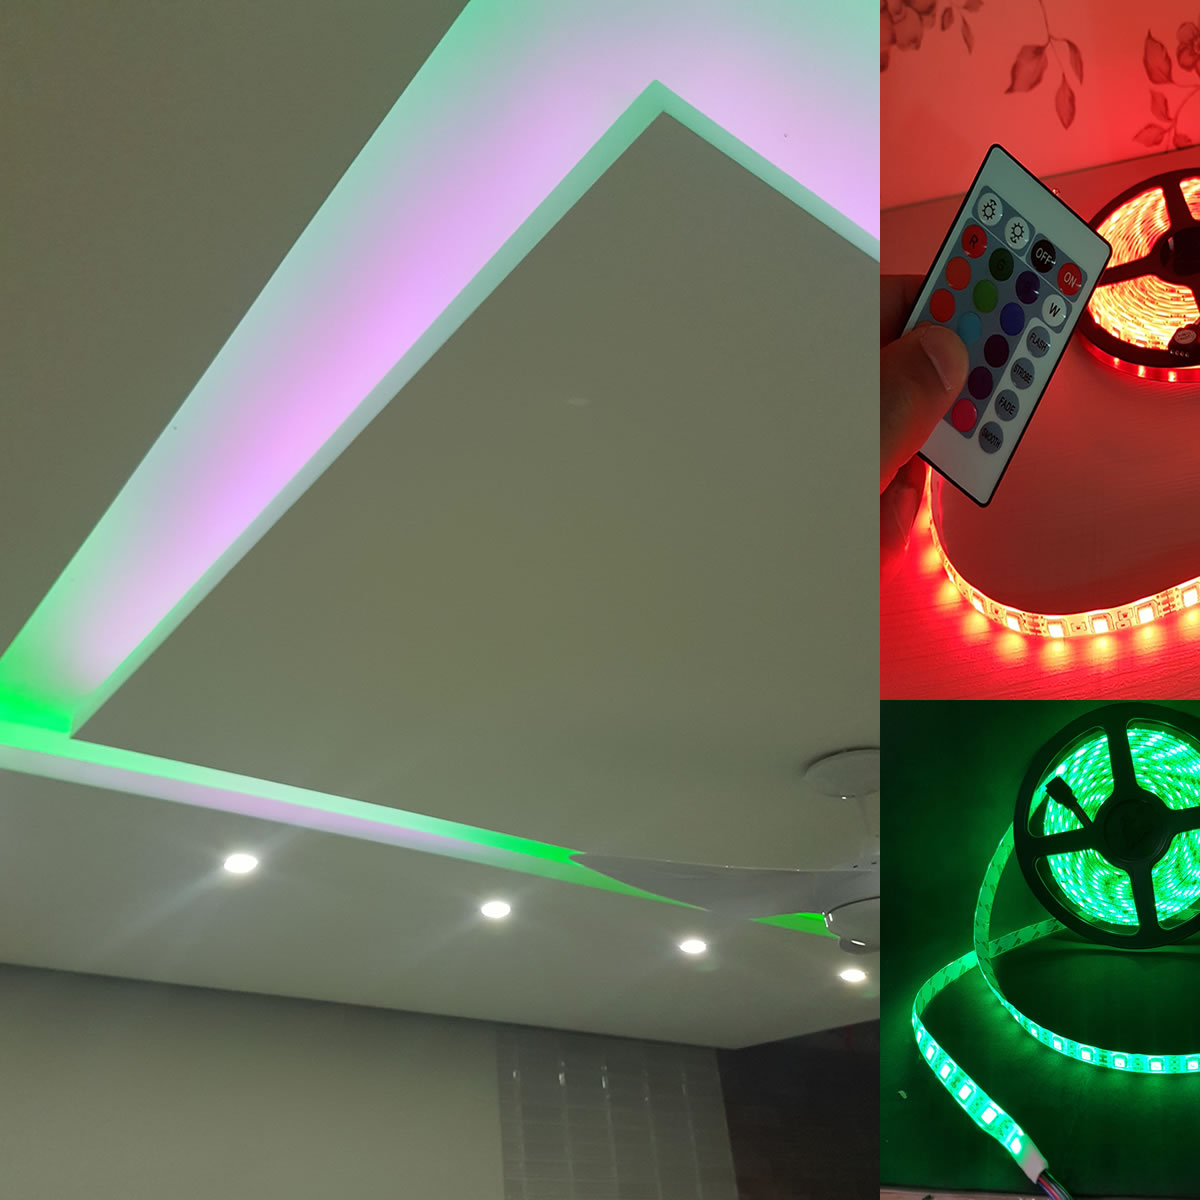 Kit Fita LED RGB 5050 com 10 Metros 10m e Controle Remoto